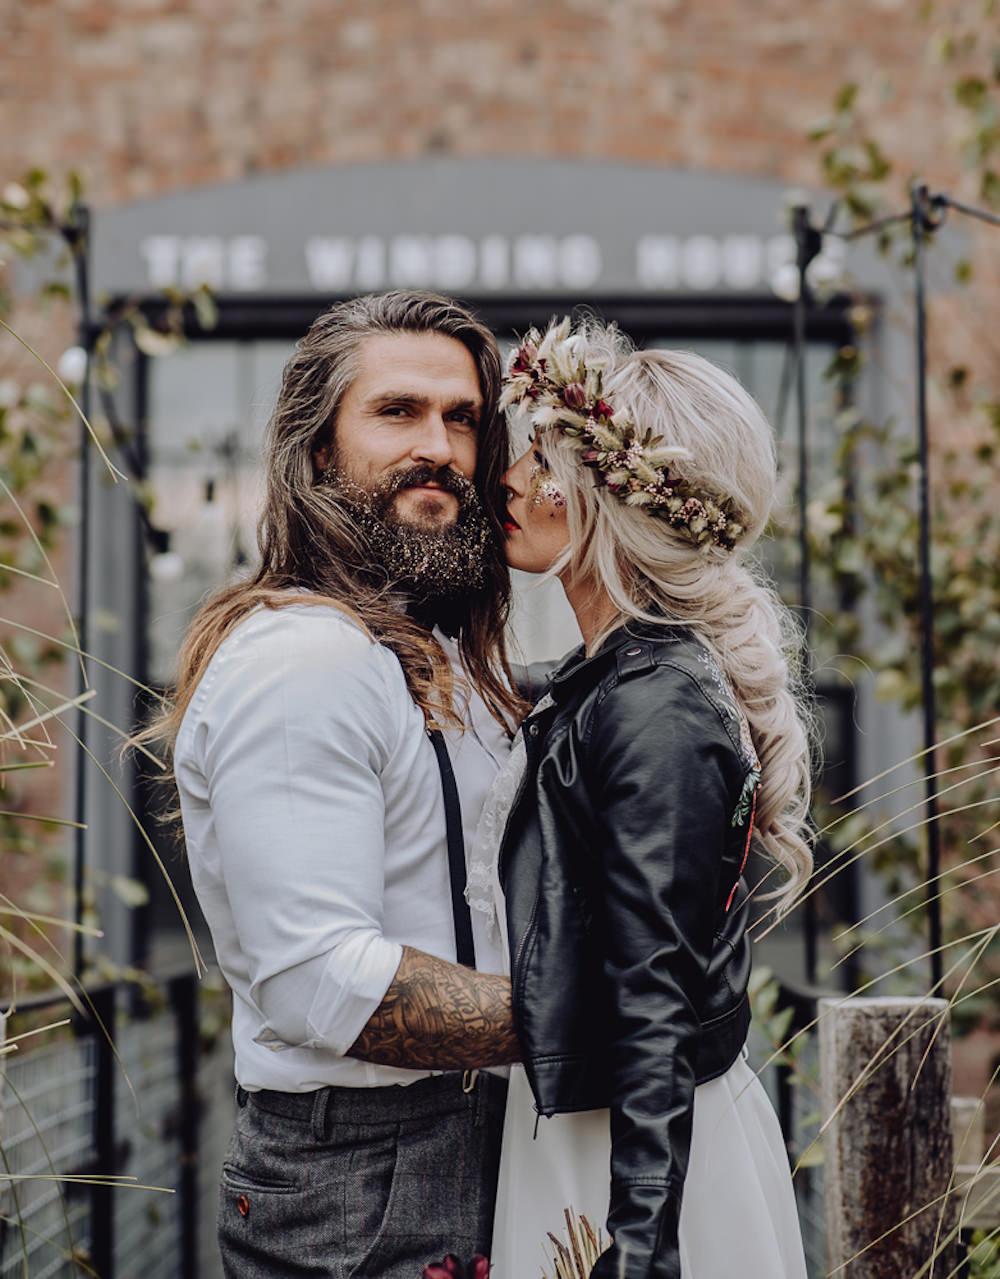 Unconventional Wedding Ideas Pierra G Photography Bride Bridal Hair Style Up Do Plait Braid Flower Crown